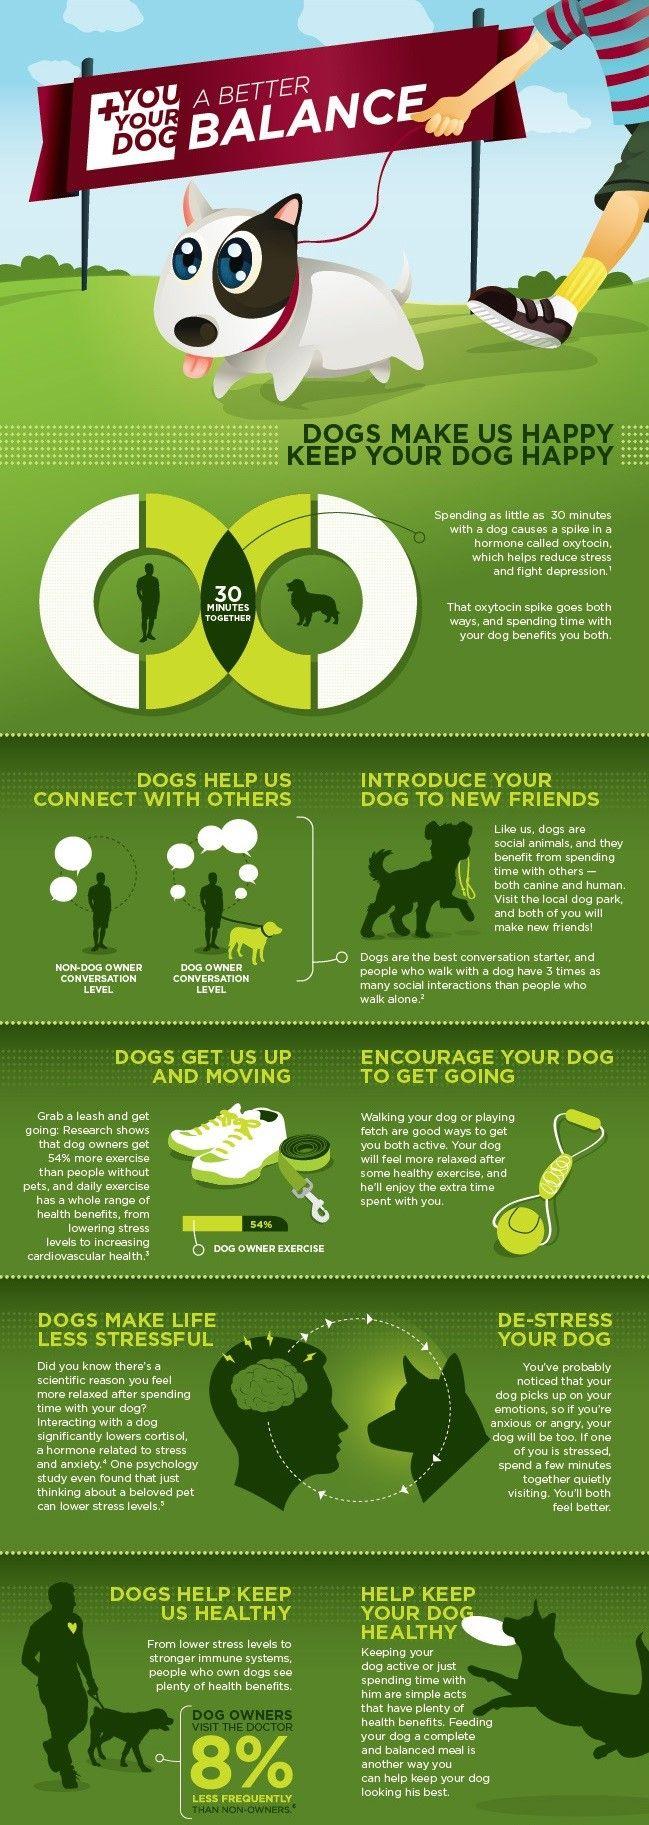 Mantenga a su perro feliz